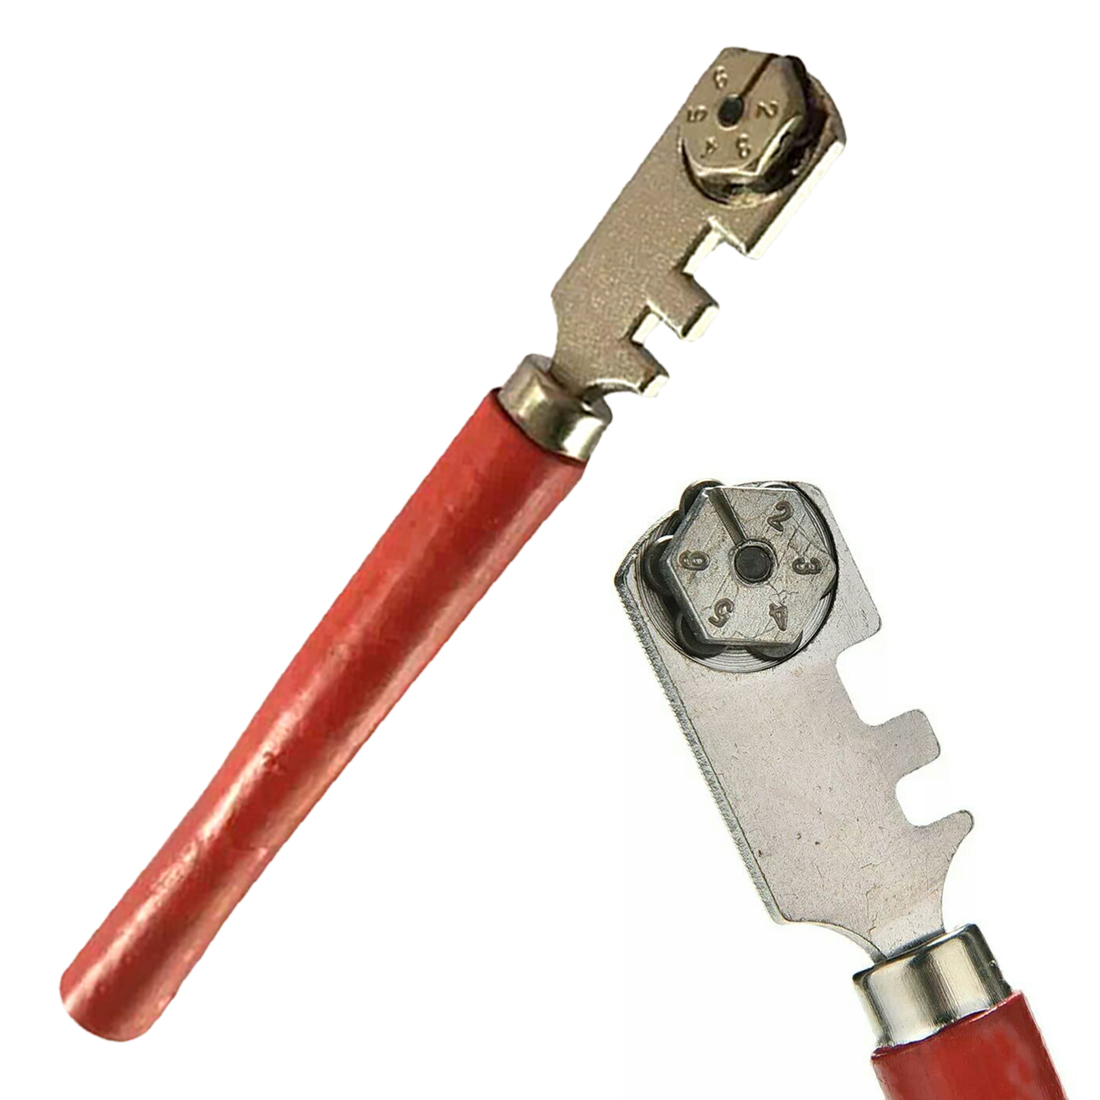 6 Wheels Steel Tile Cutter Scriber Multifunctional Glass Cutter Engraver Roller Engraving Cutting Craft Glass Cutting Knife